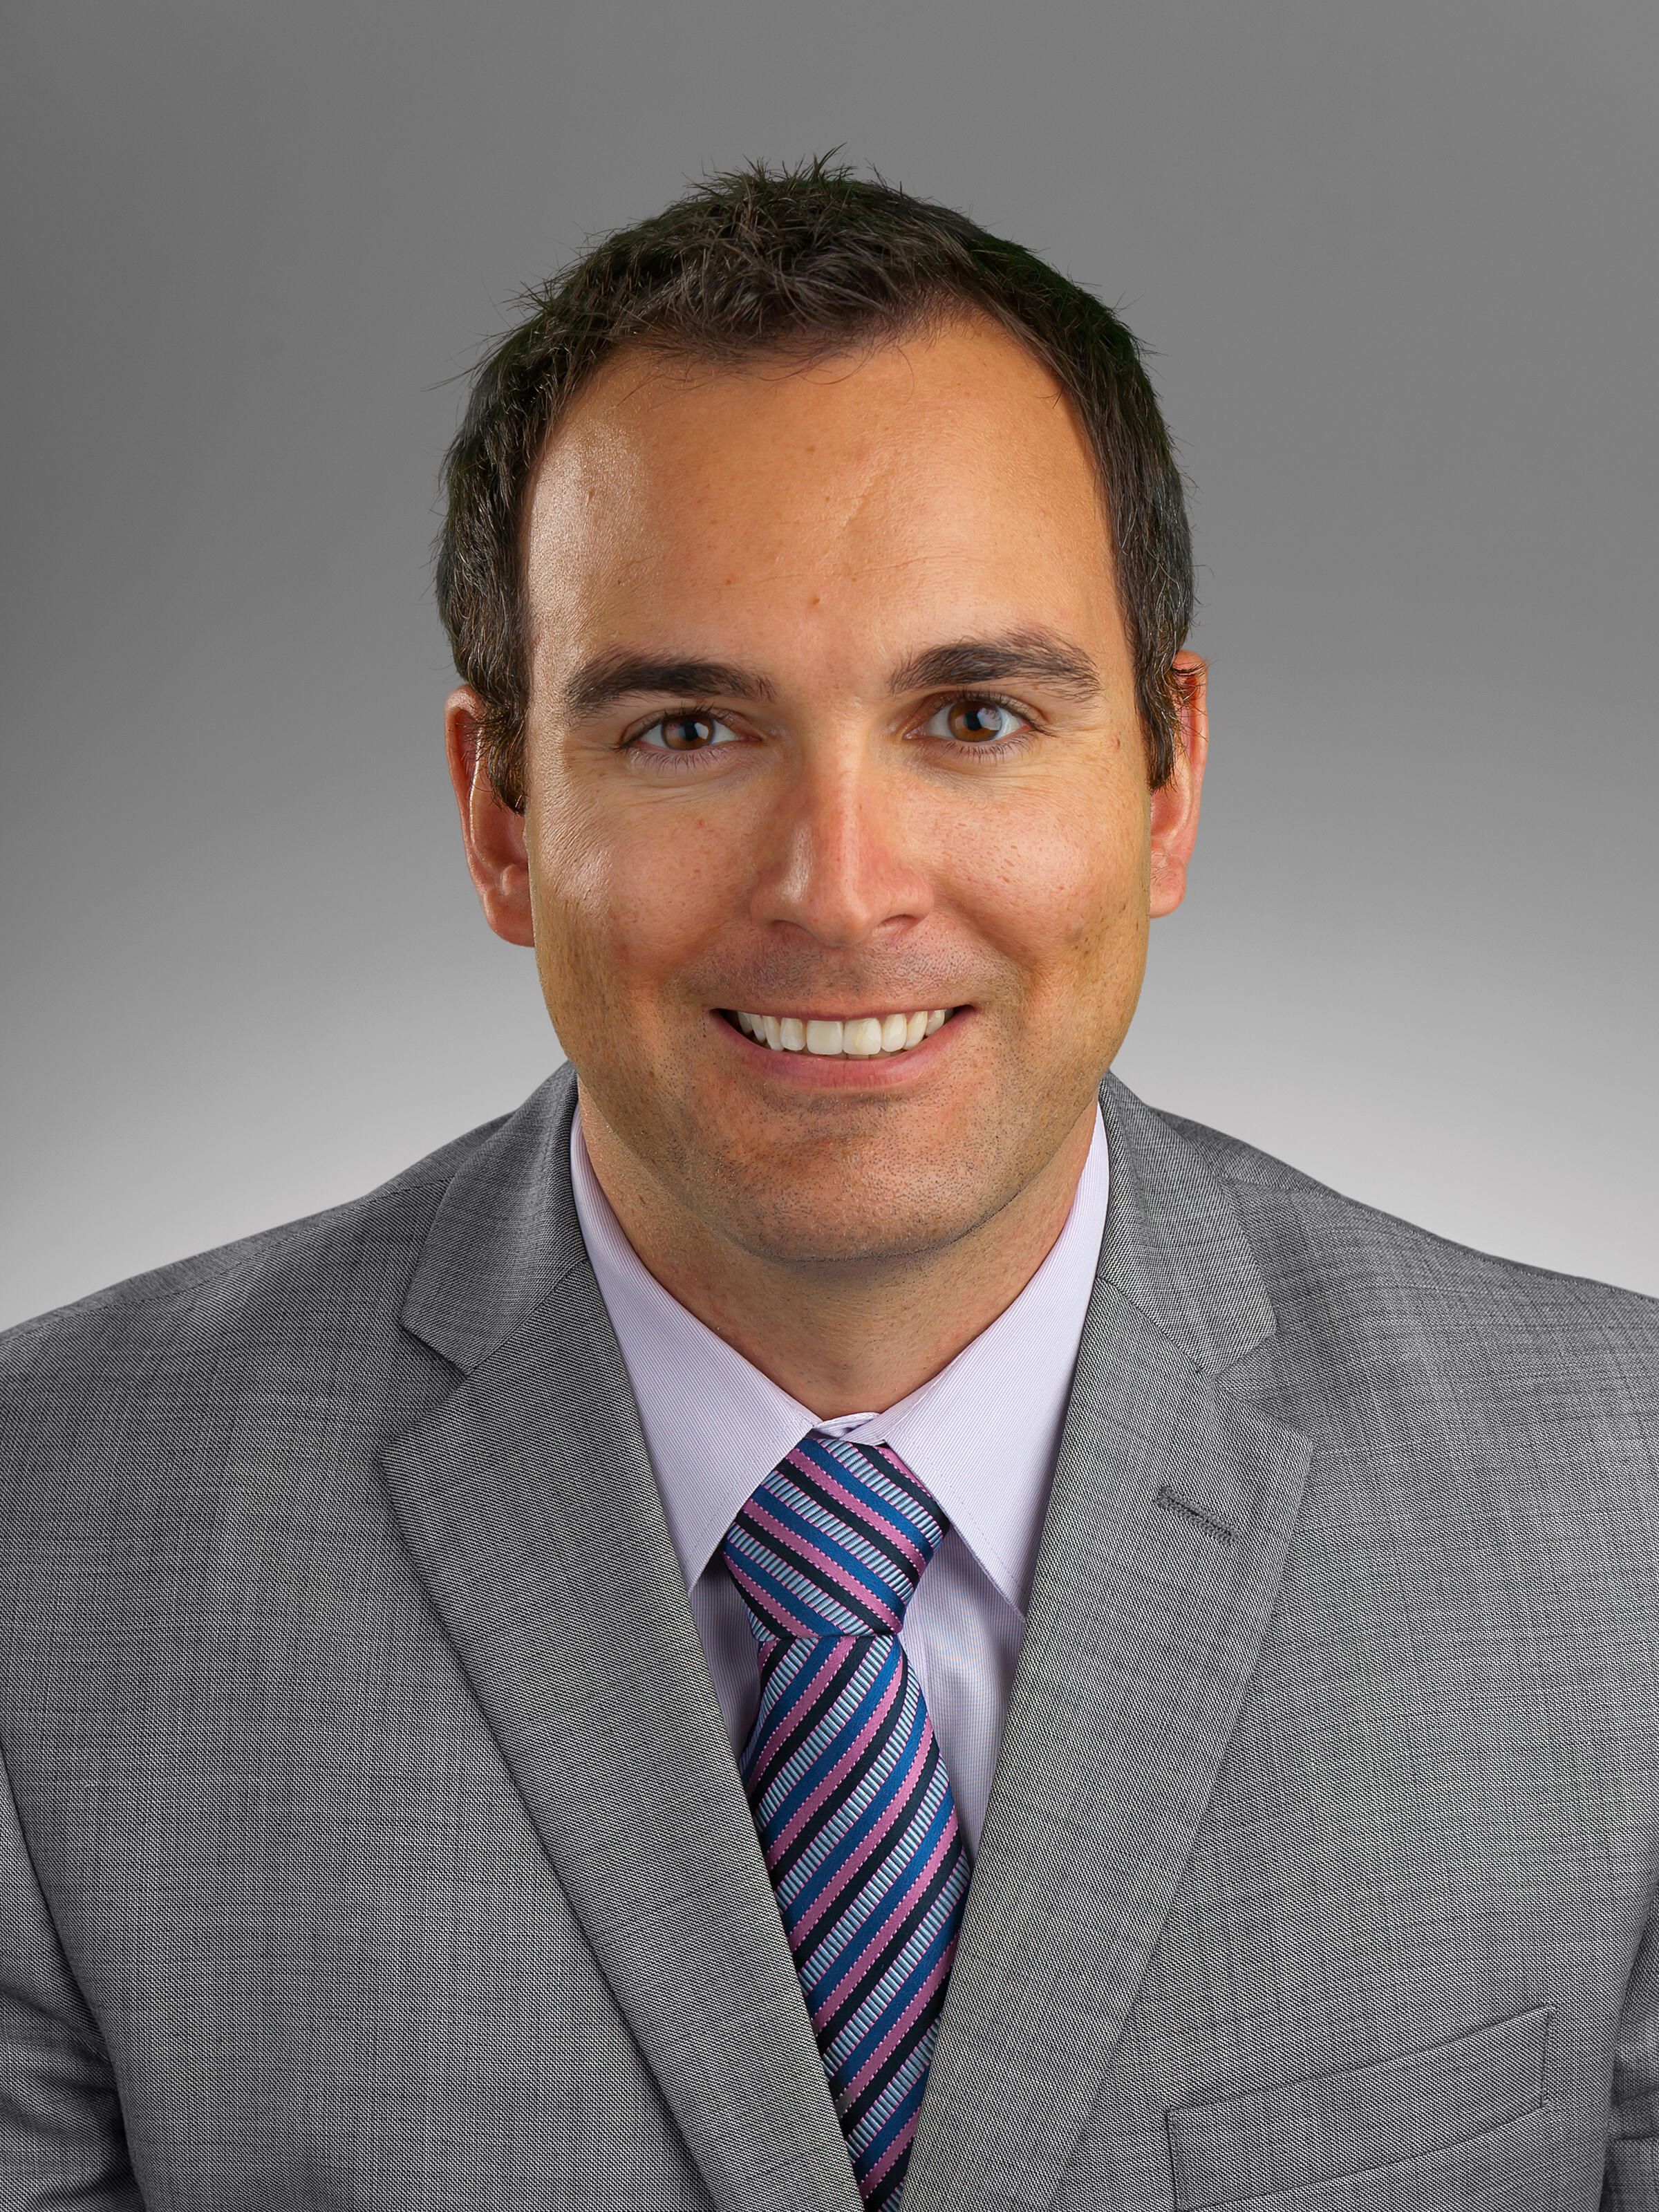 Andrew J Burgard MD